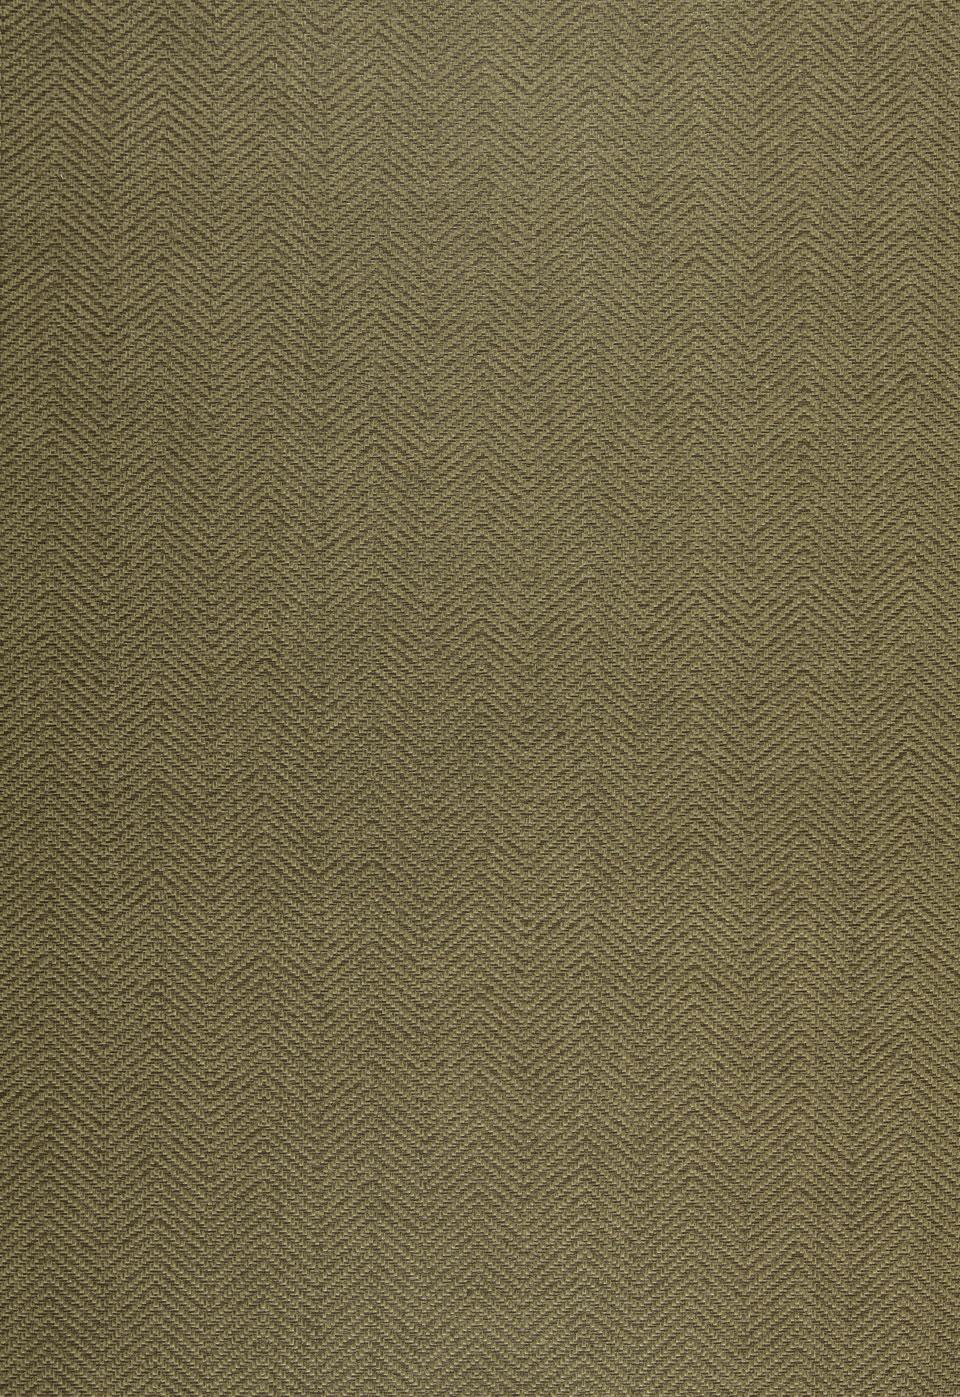 Американские обои Schumacher,  коллекция Luxe Lodge, артикул5006173